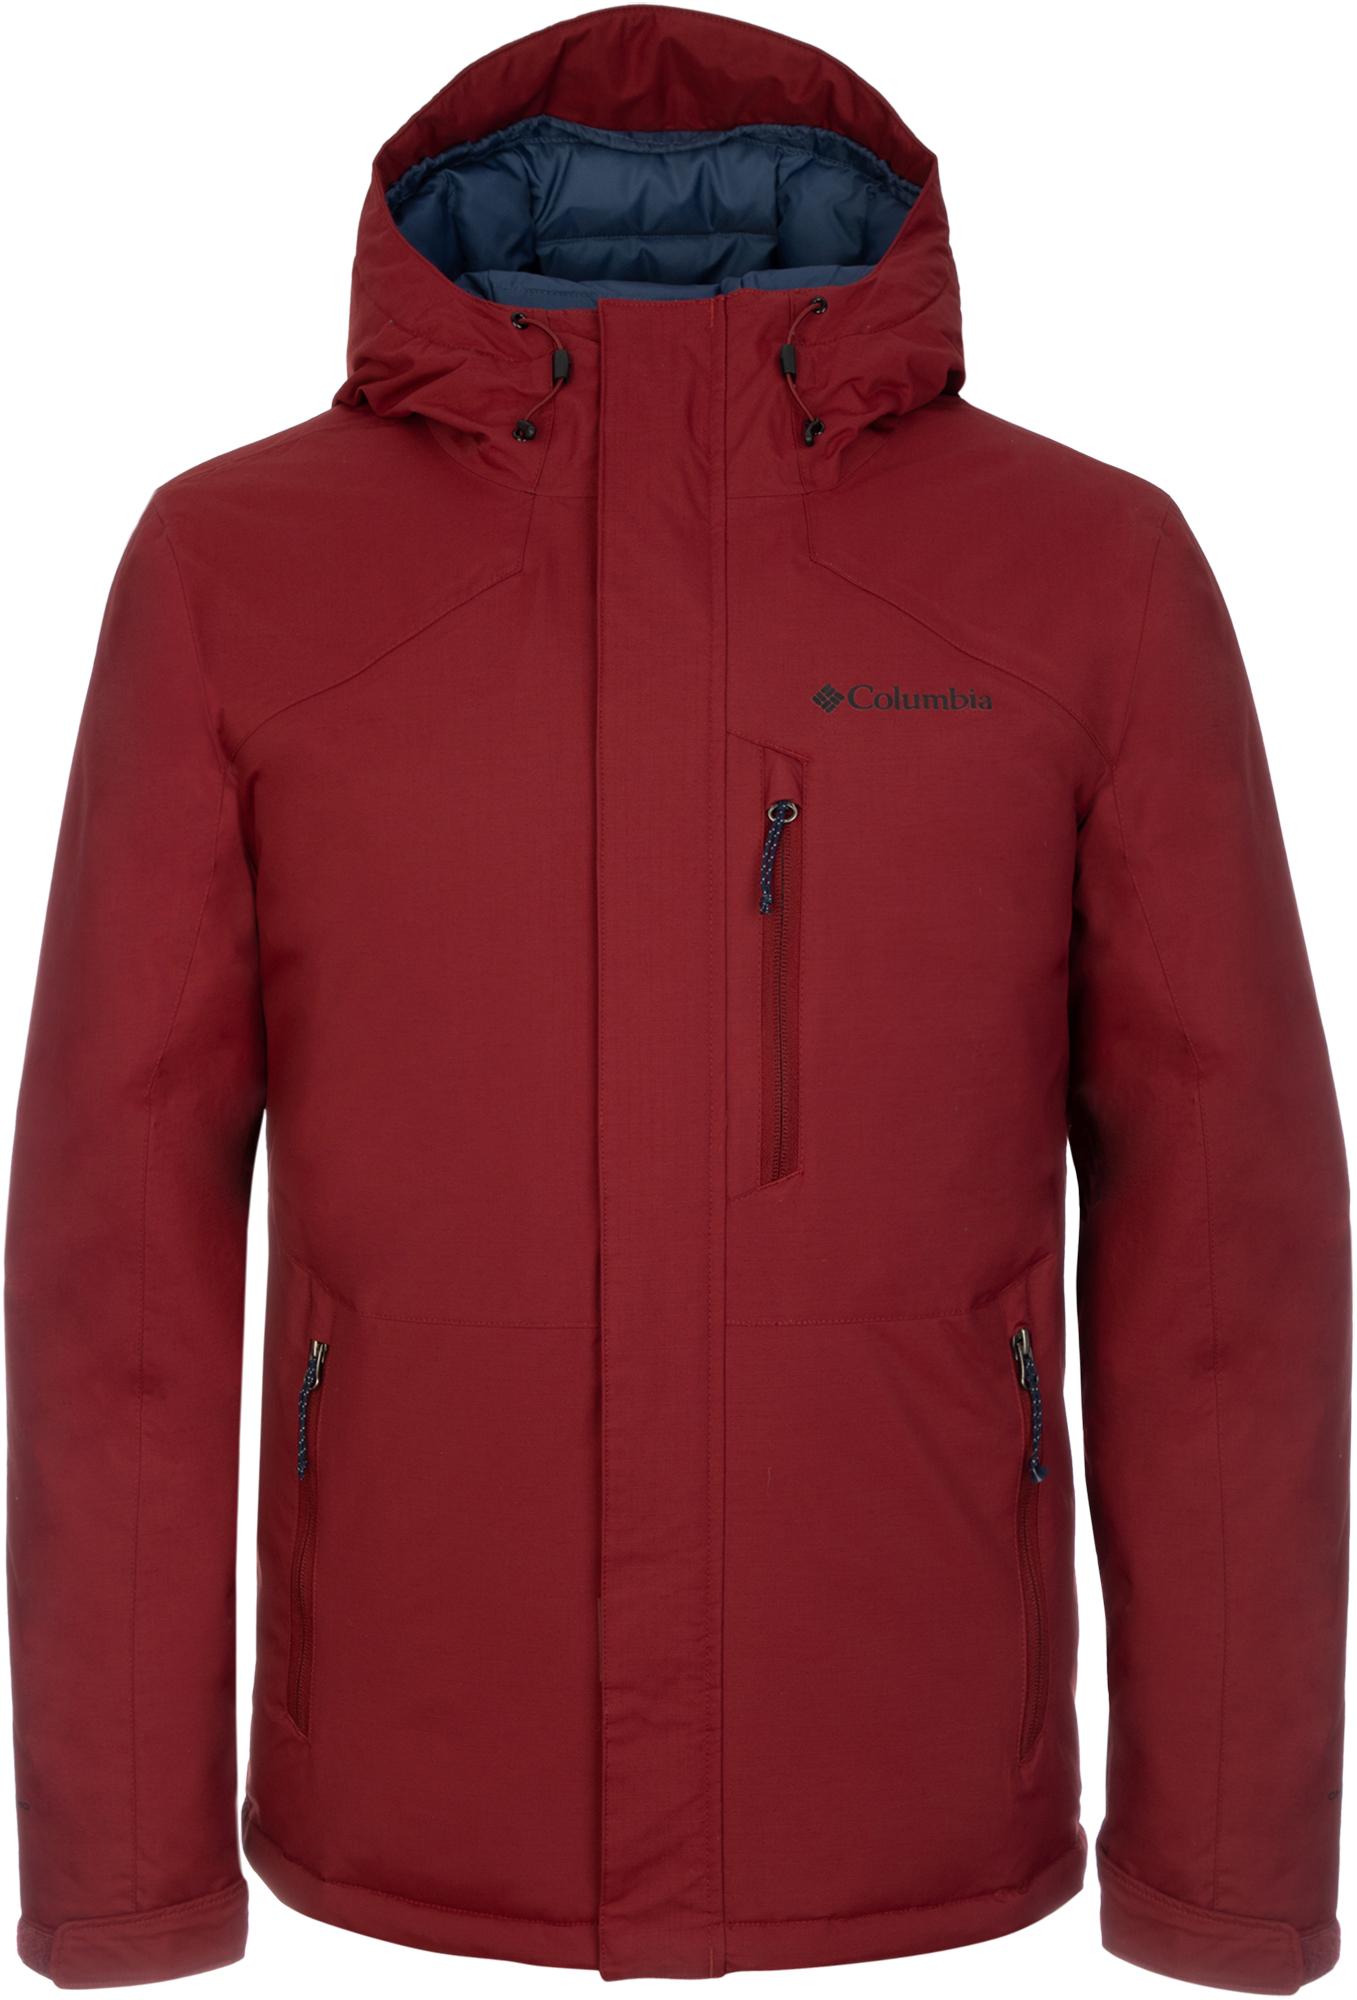 Columbia Куртка утепленная мужская Columbia Murr Peak II, размер 52-54 цены